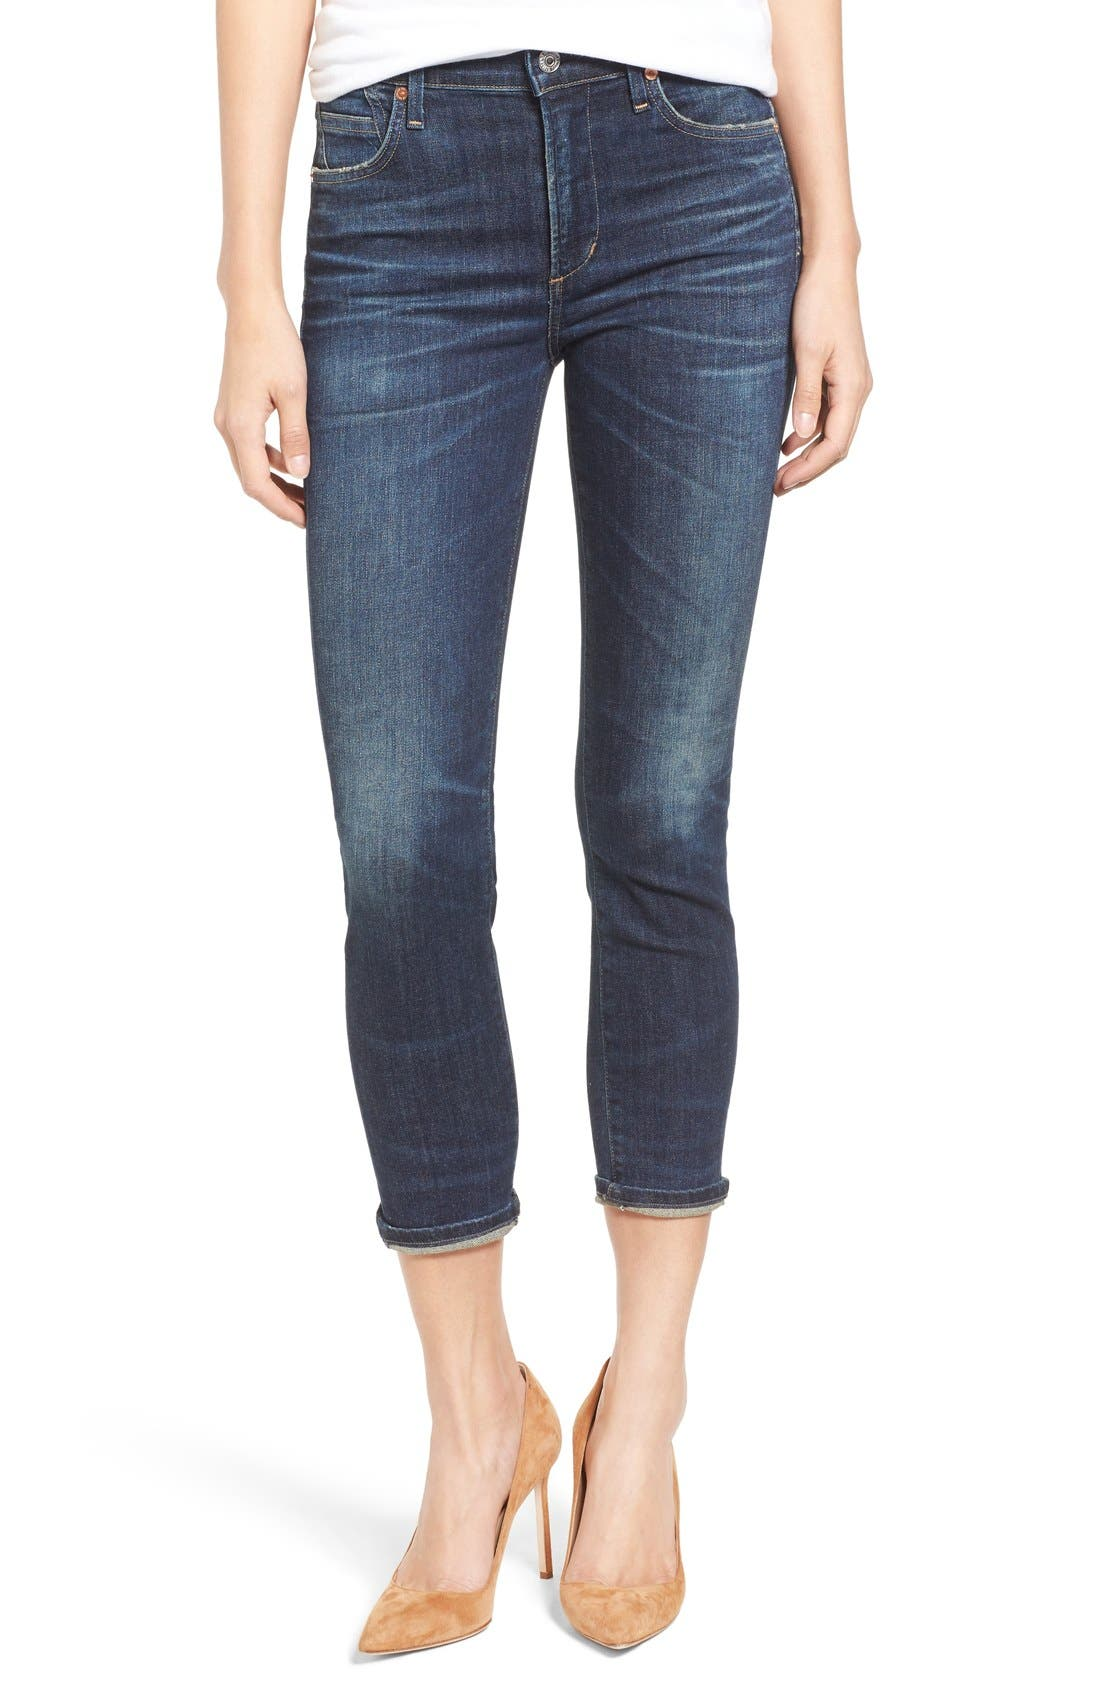 Rocket High Waist Crop Skinny Jeans,                             Alternate thumbnail 4, color,                             410